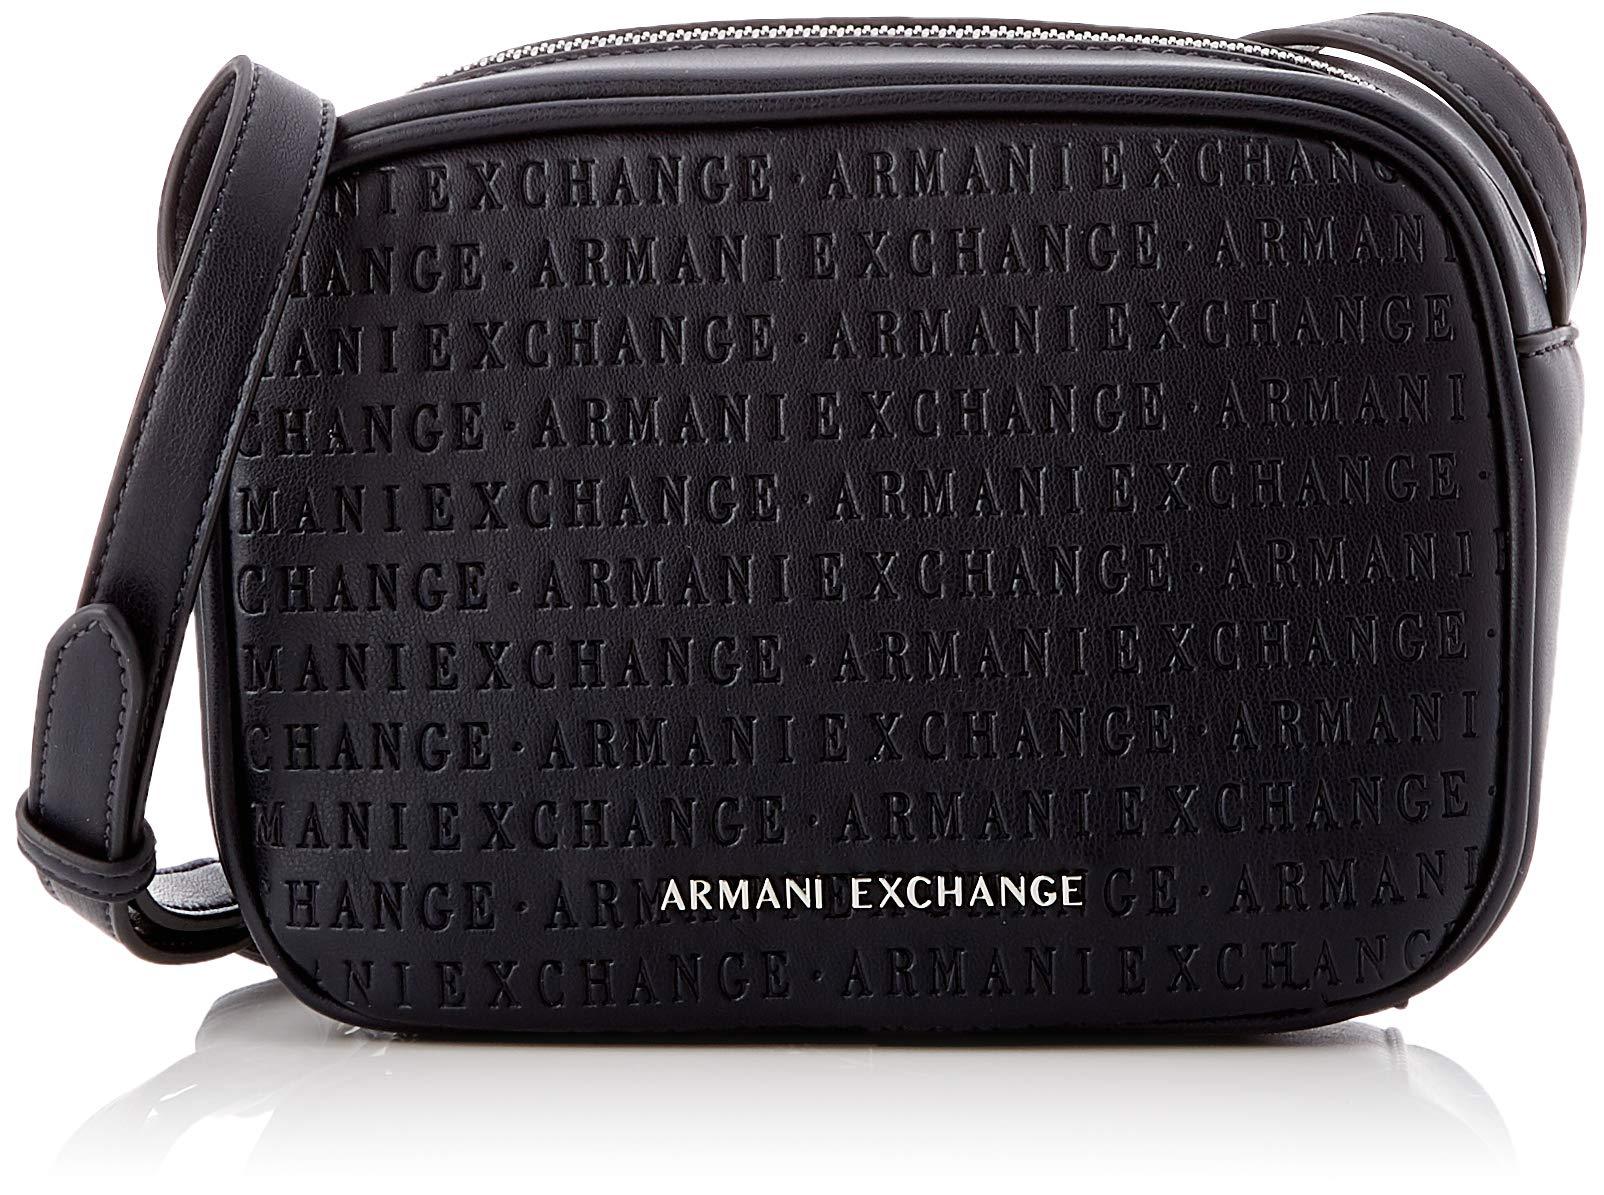 Exchange 5 BagSacs Crossbody Armani X T Small FemmeBleunavy13x7x18 Cmb H Bandoulière H2WDEIYe9b